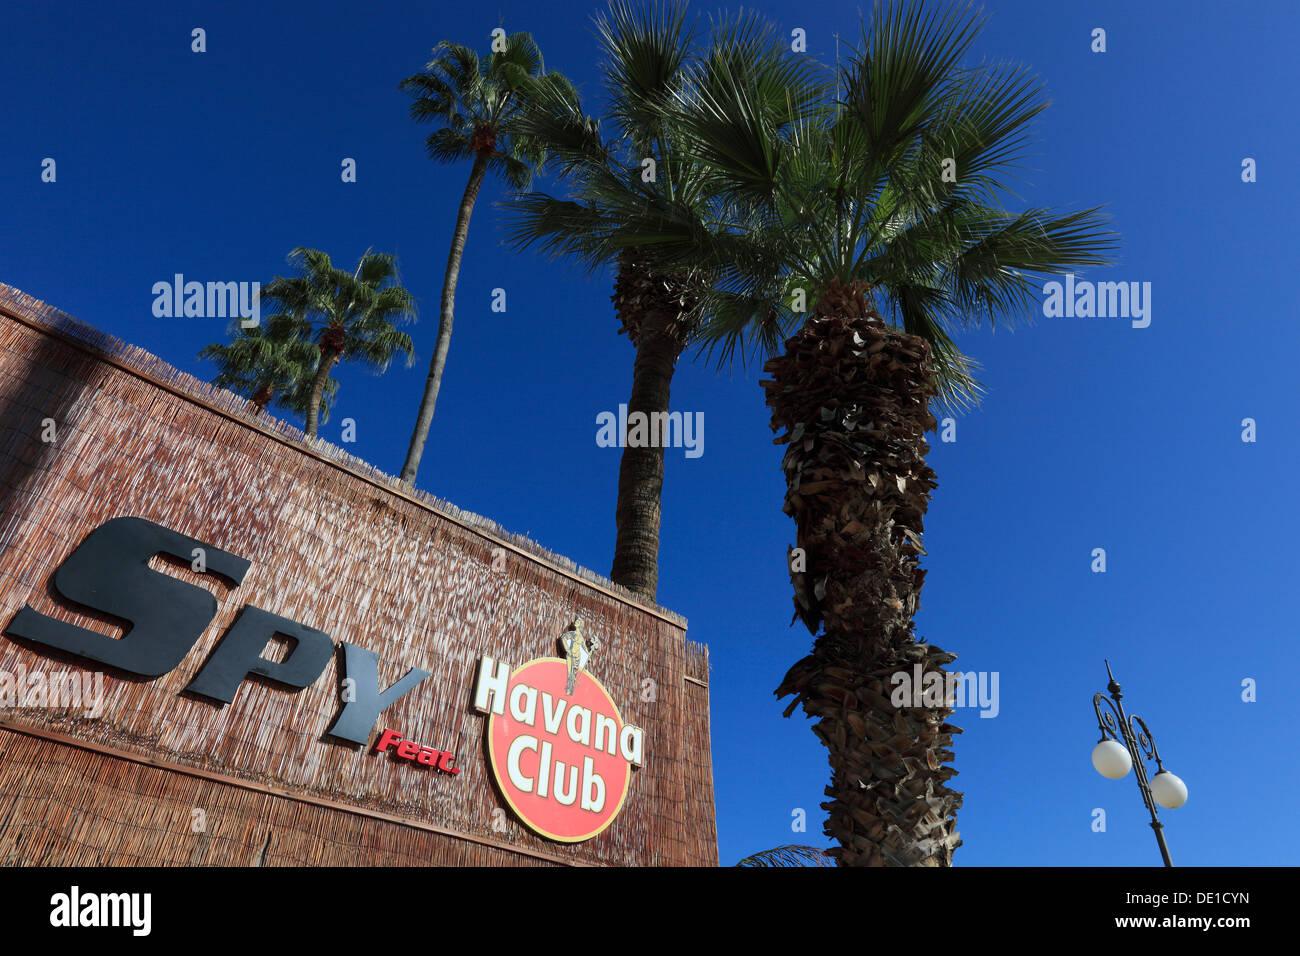 Zypern, Larnaca, Havana Club, Werbung, Palmen Stockbild